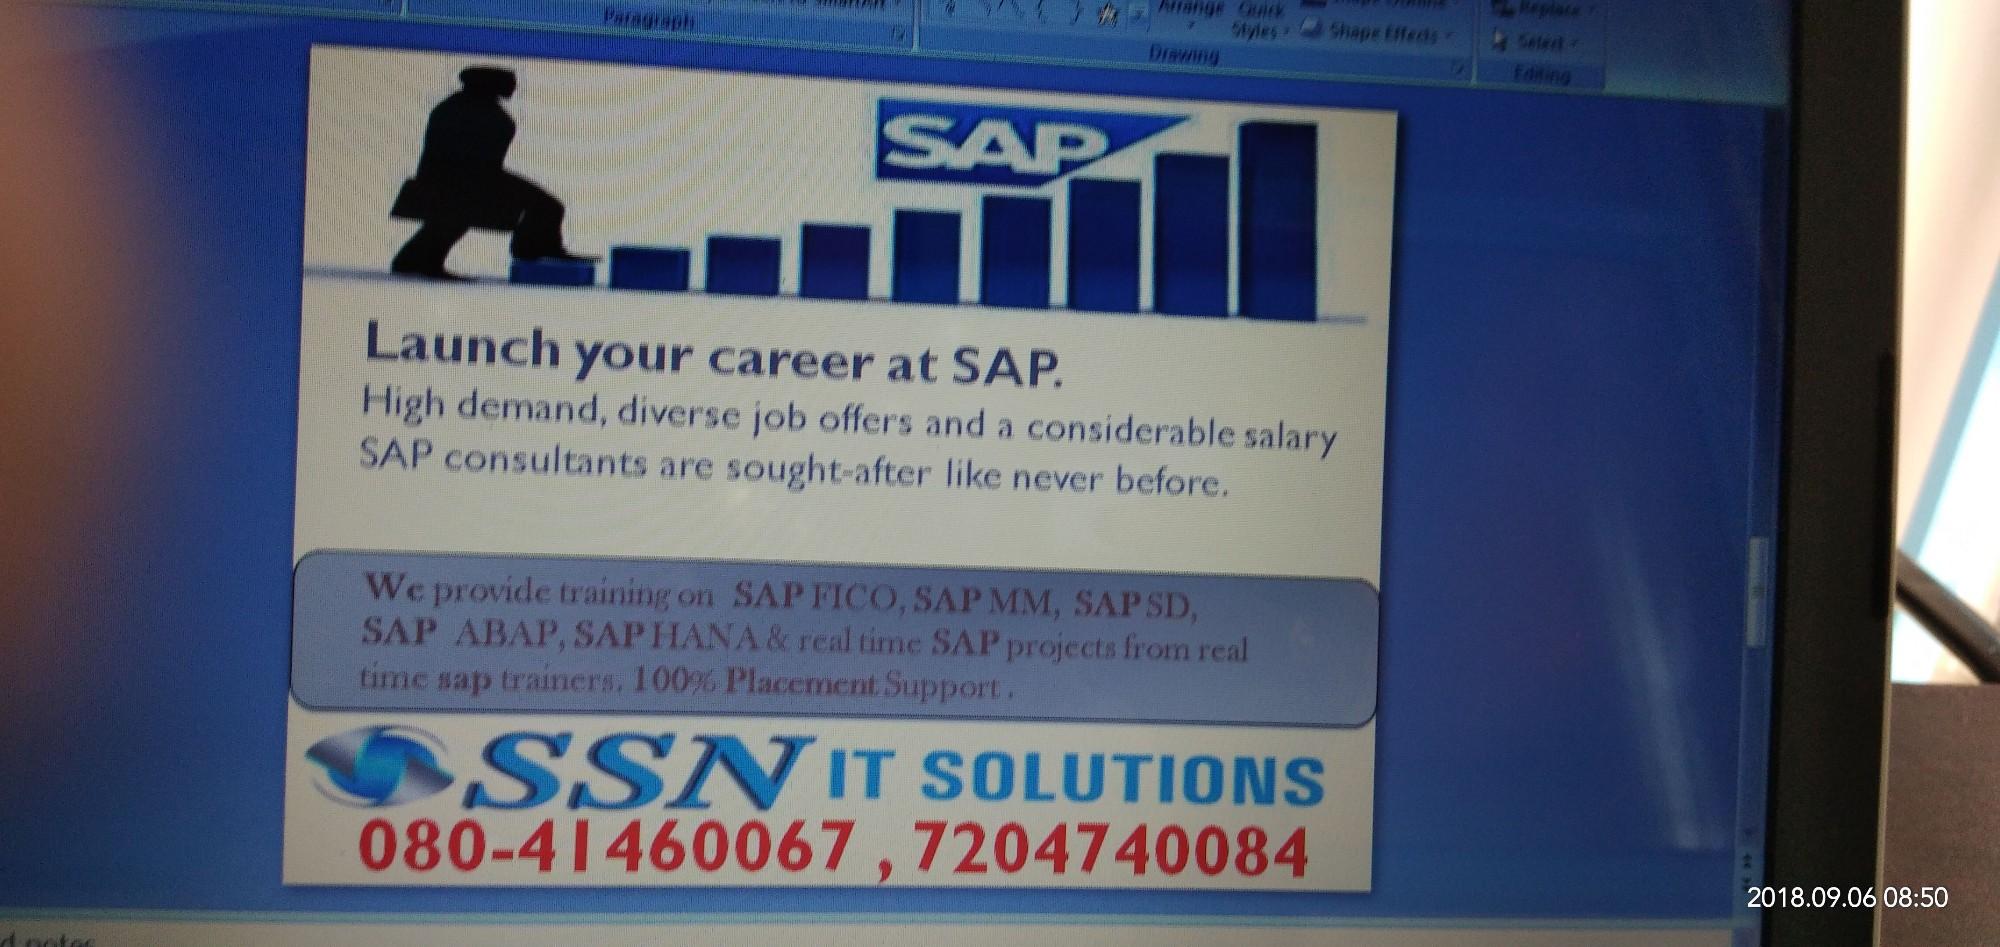 SSN It Solutions in Marathahalli, Bangalore-560037 | Sulekha